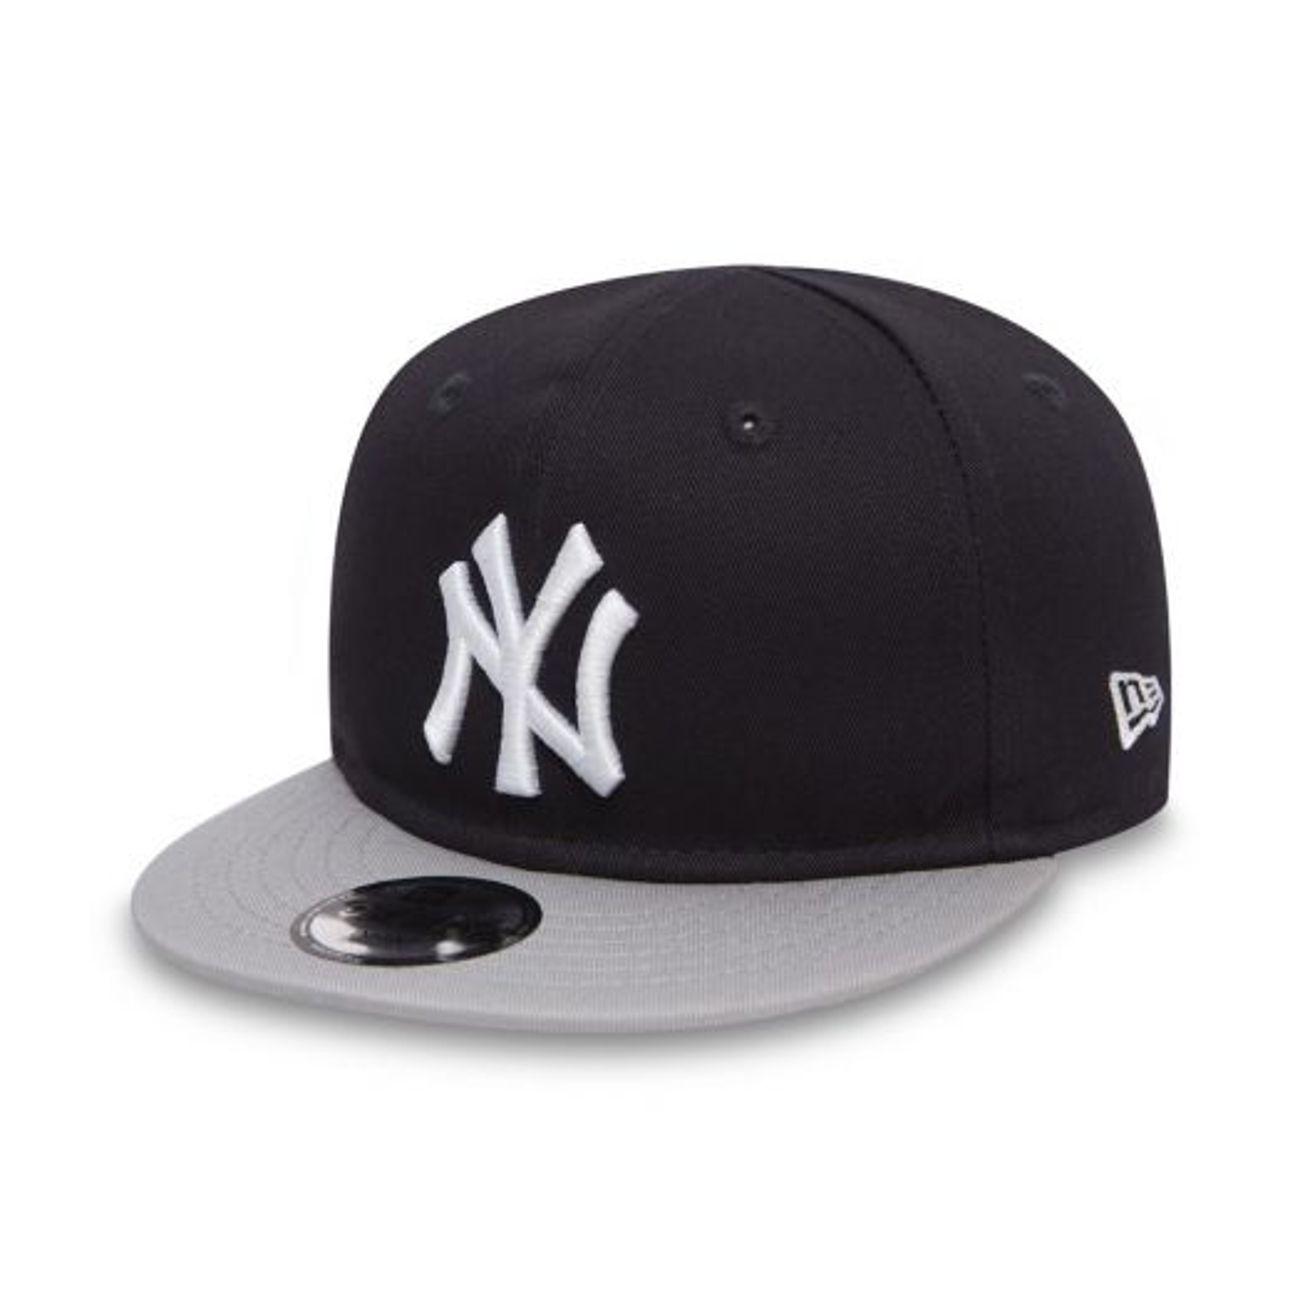 Mode- Lifestyle Bébé NEW ERA Casquette Bébé New Era New York Yankees Infant  My 1st ... b619491e1e4